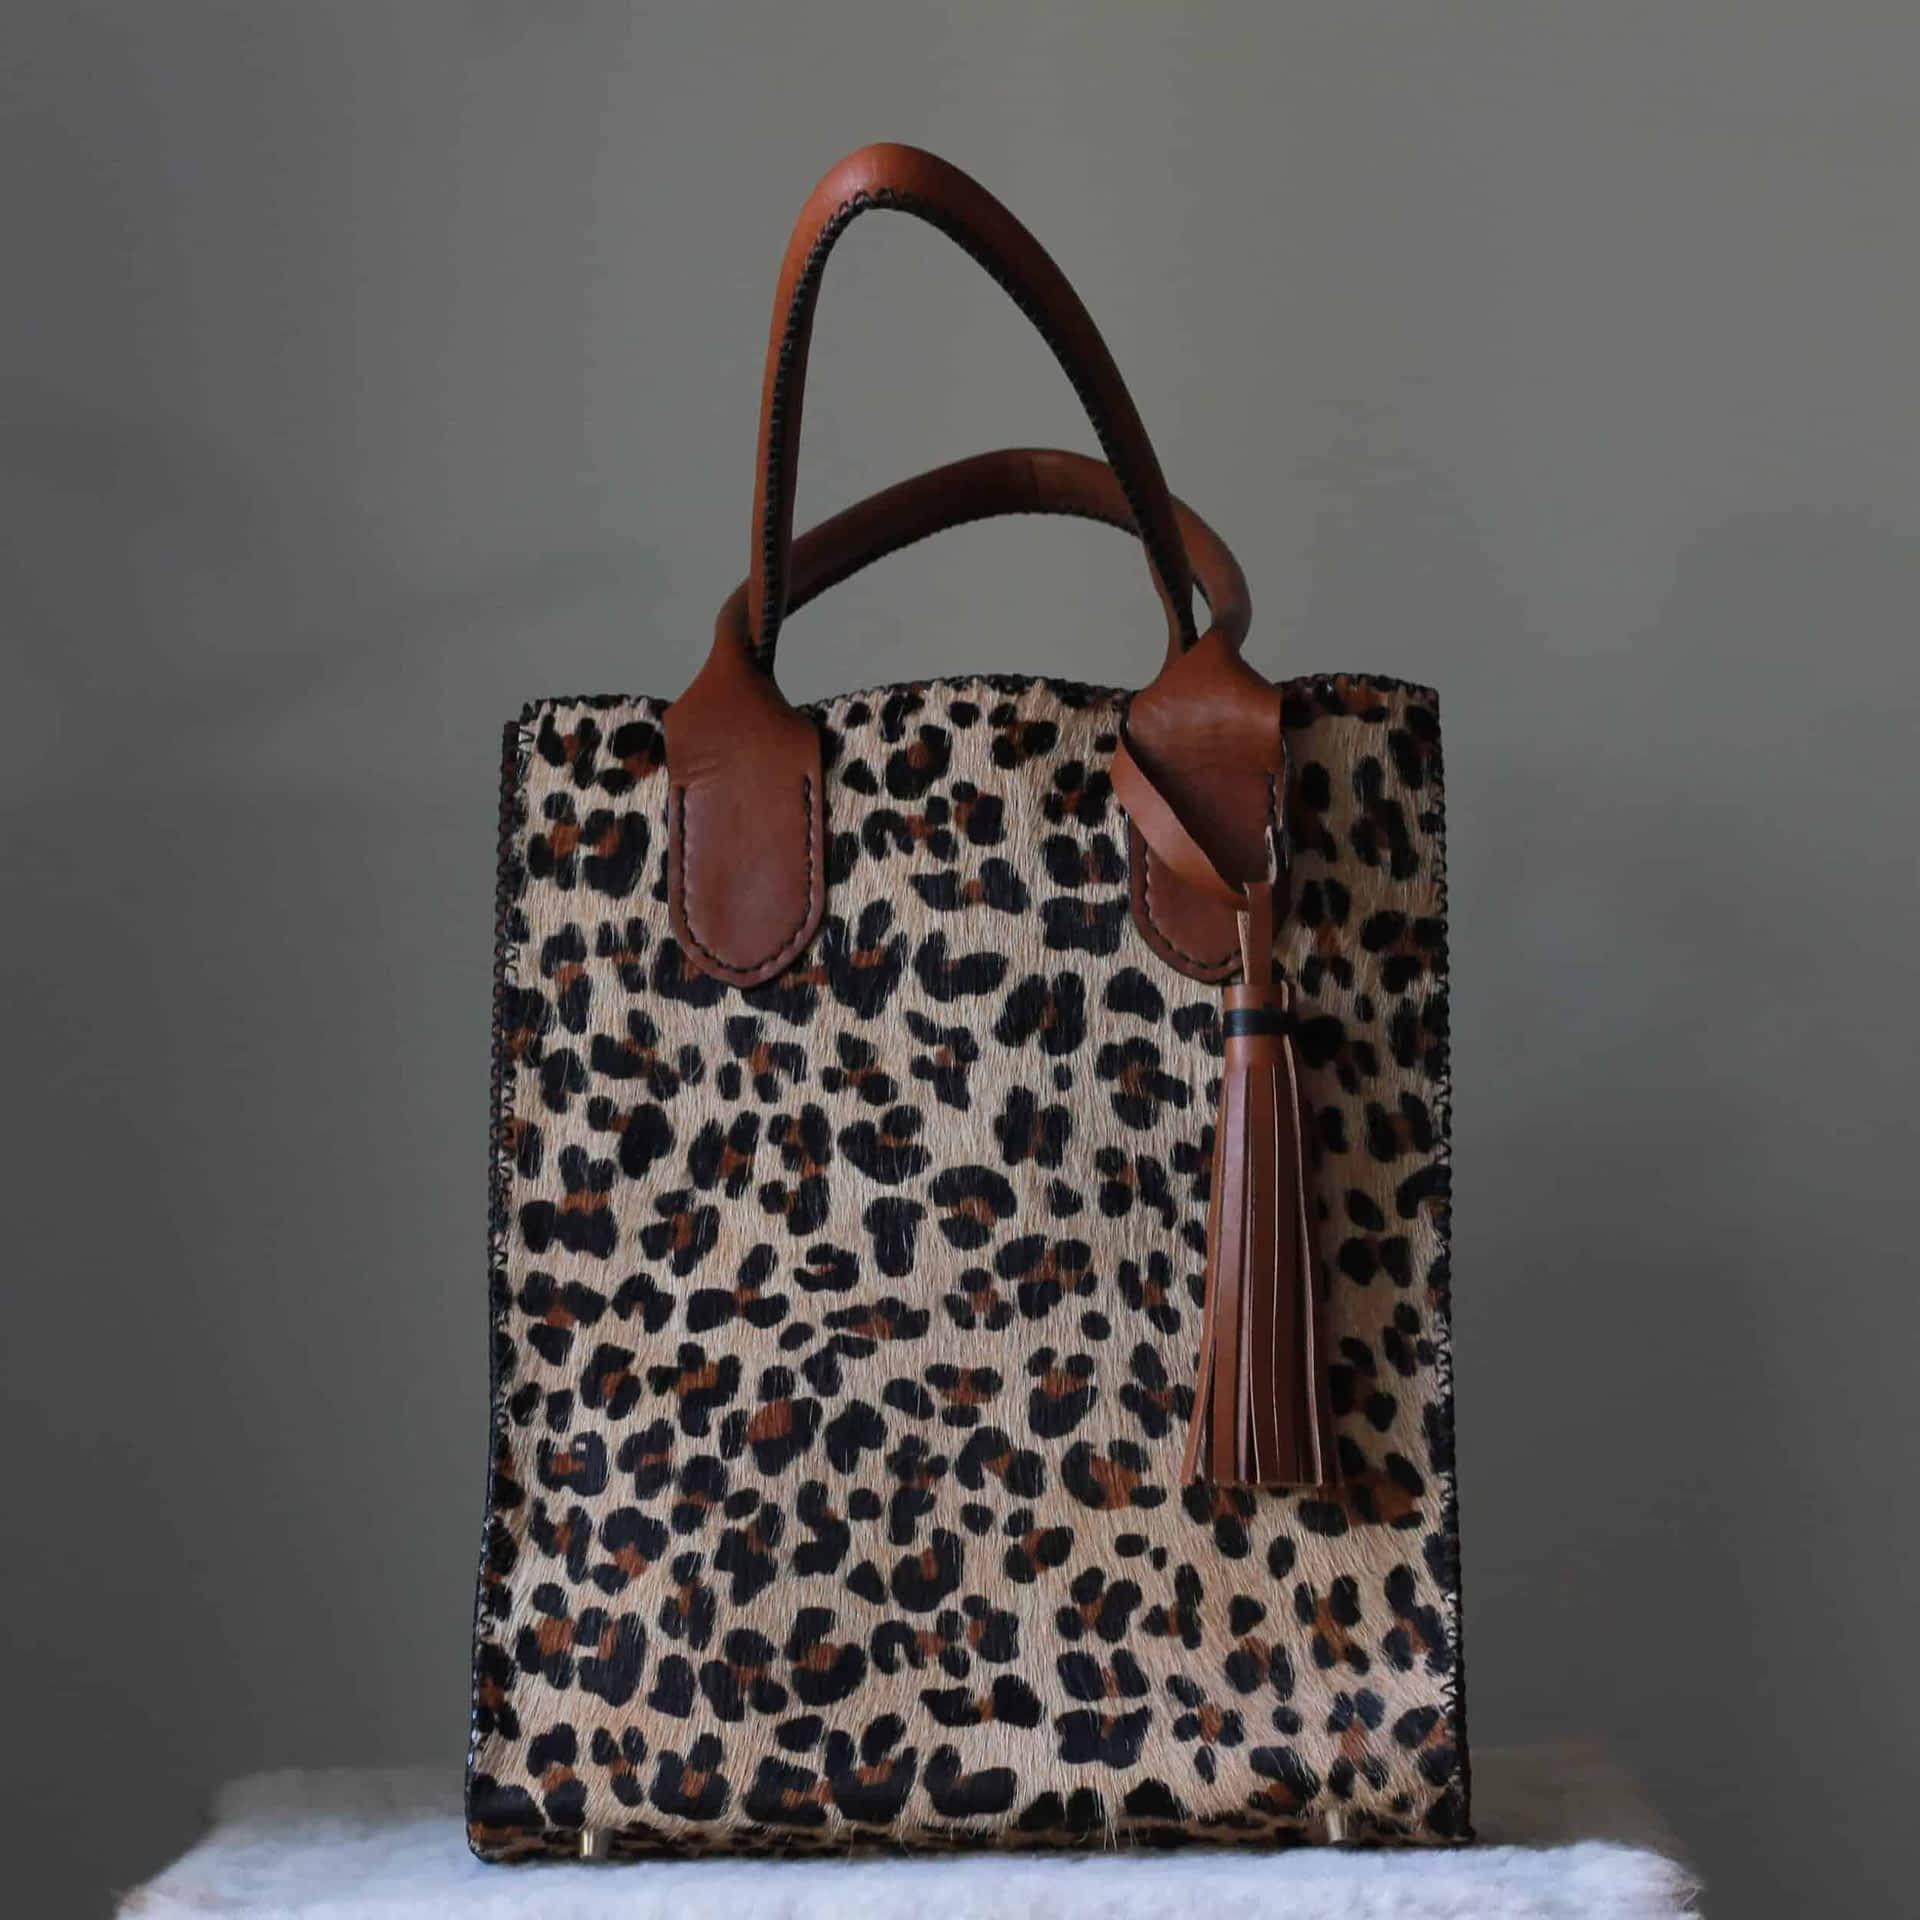 Tote bag - Handbag